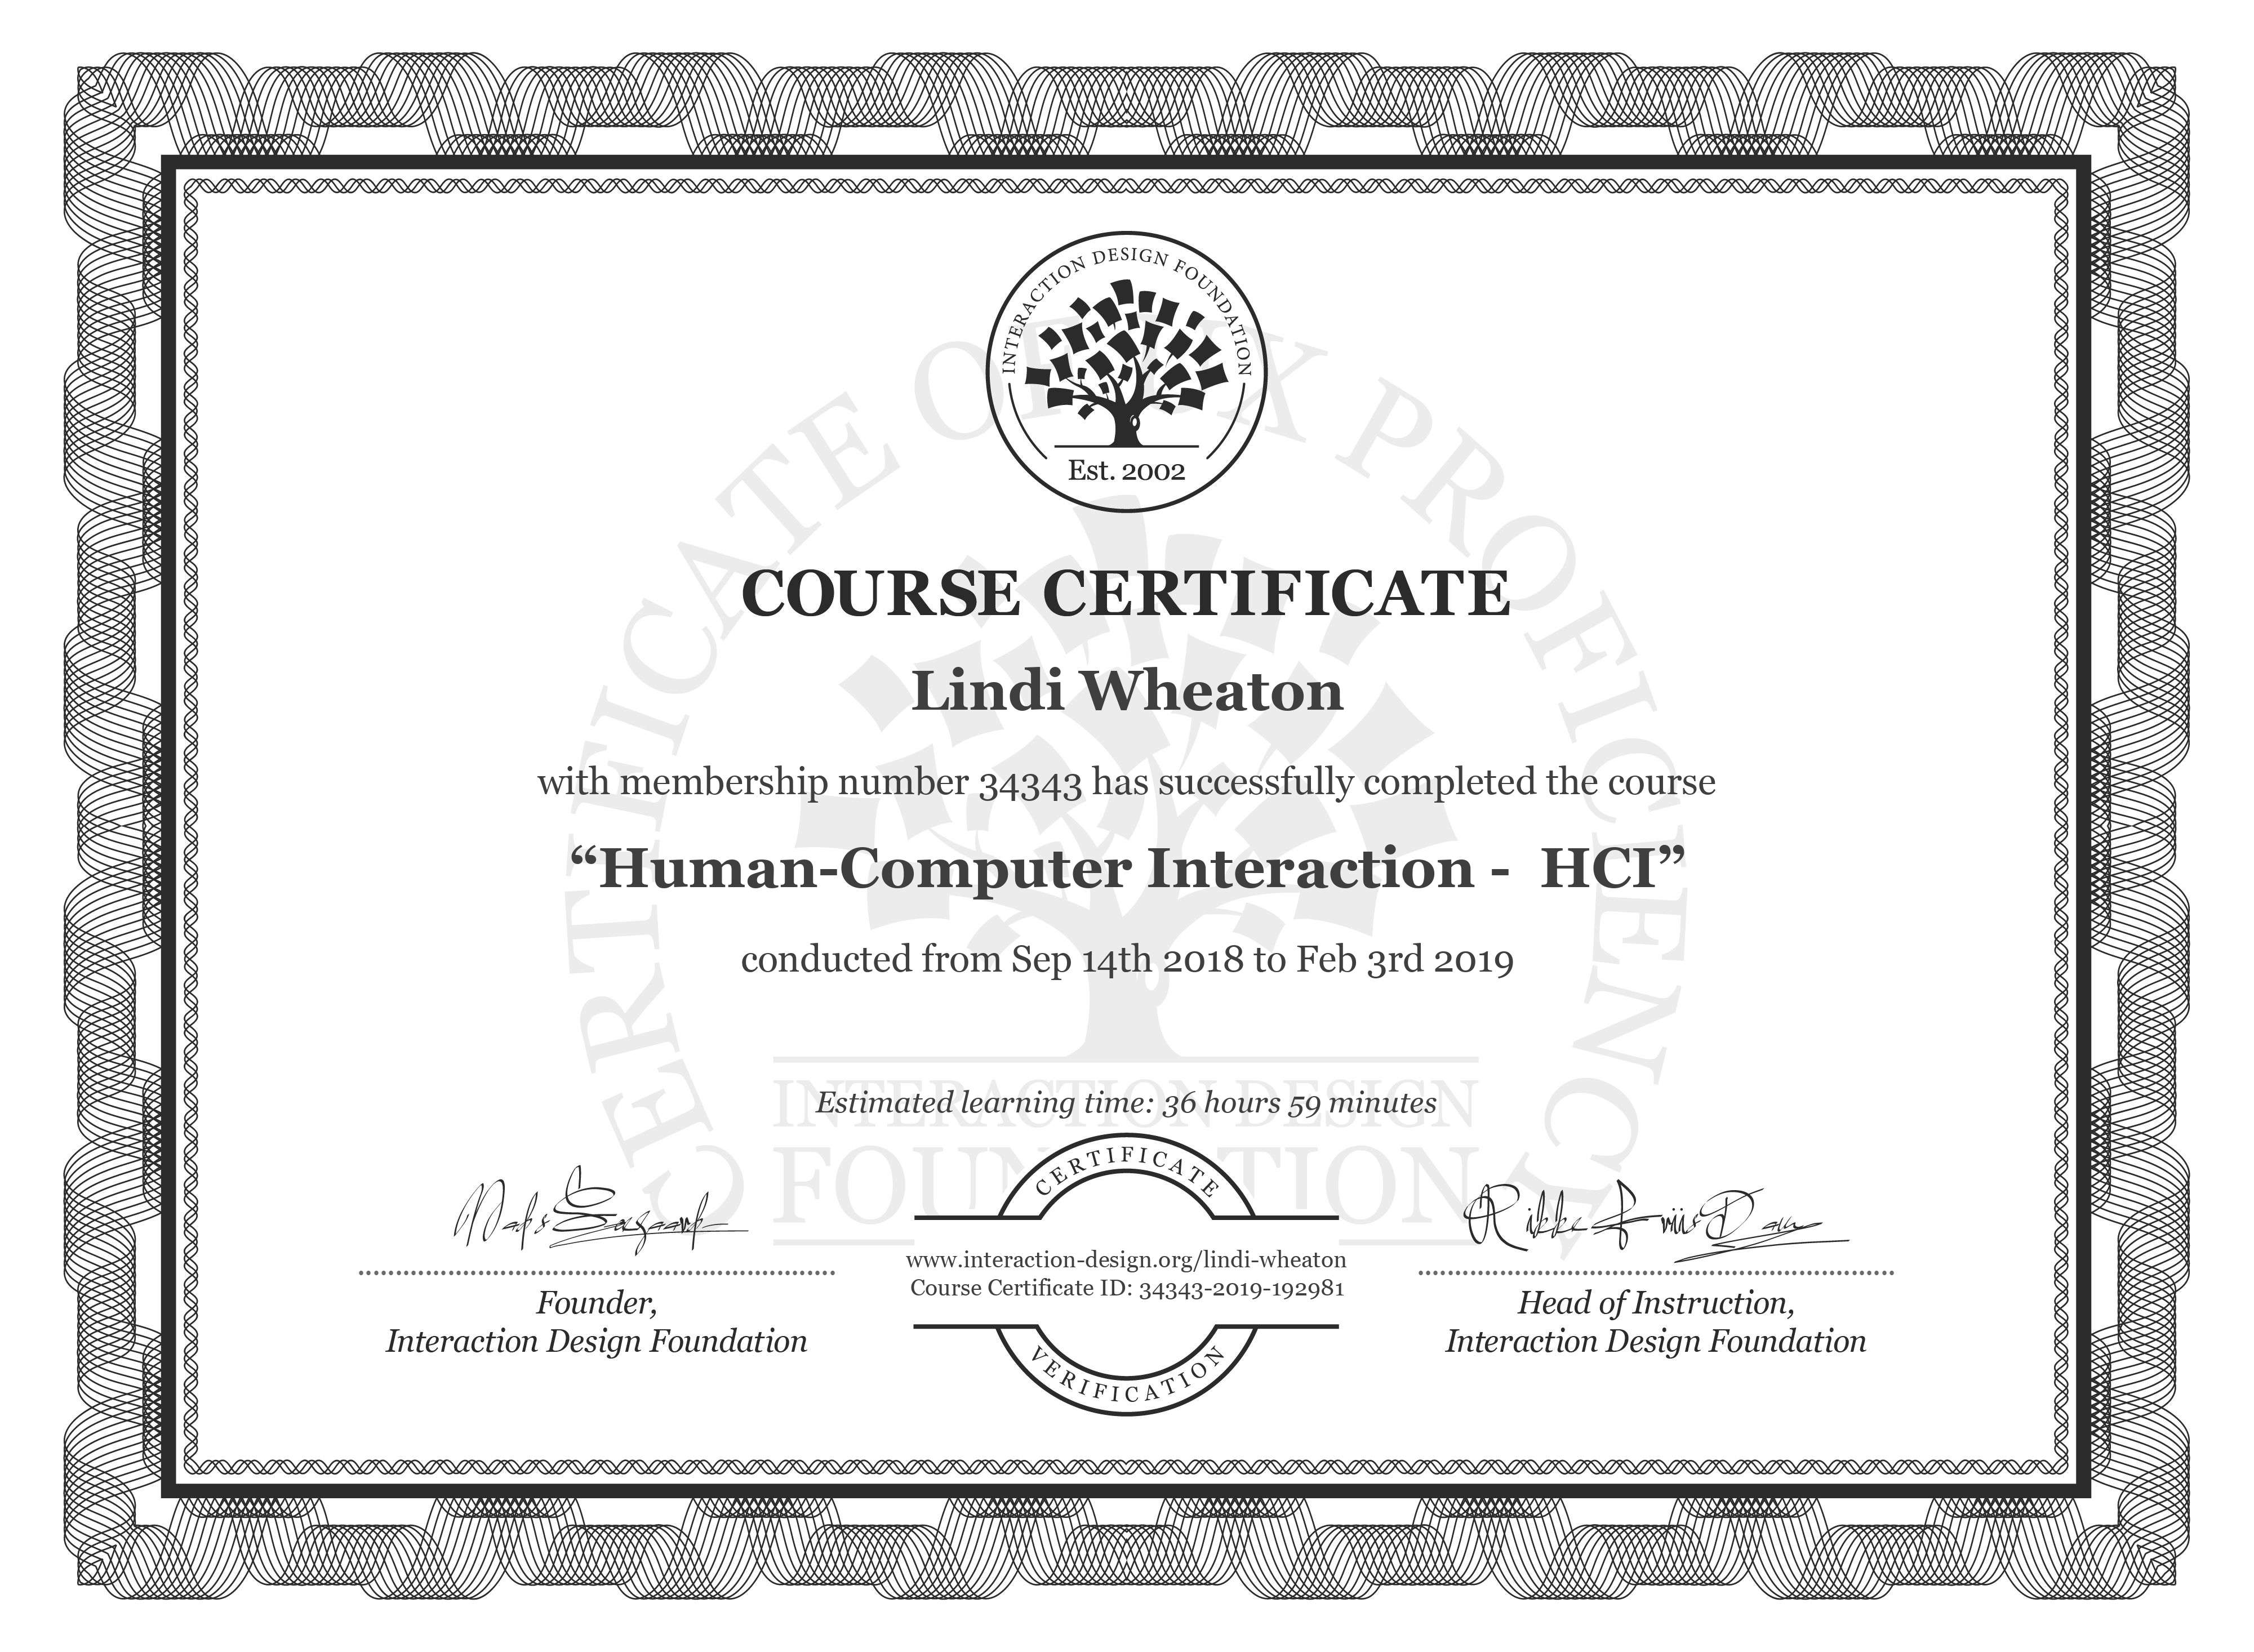 Lindi Wheaton's Course Certificate: Human-Computer Interaction -  HCI